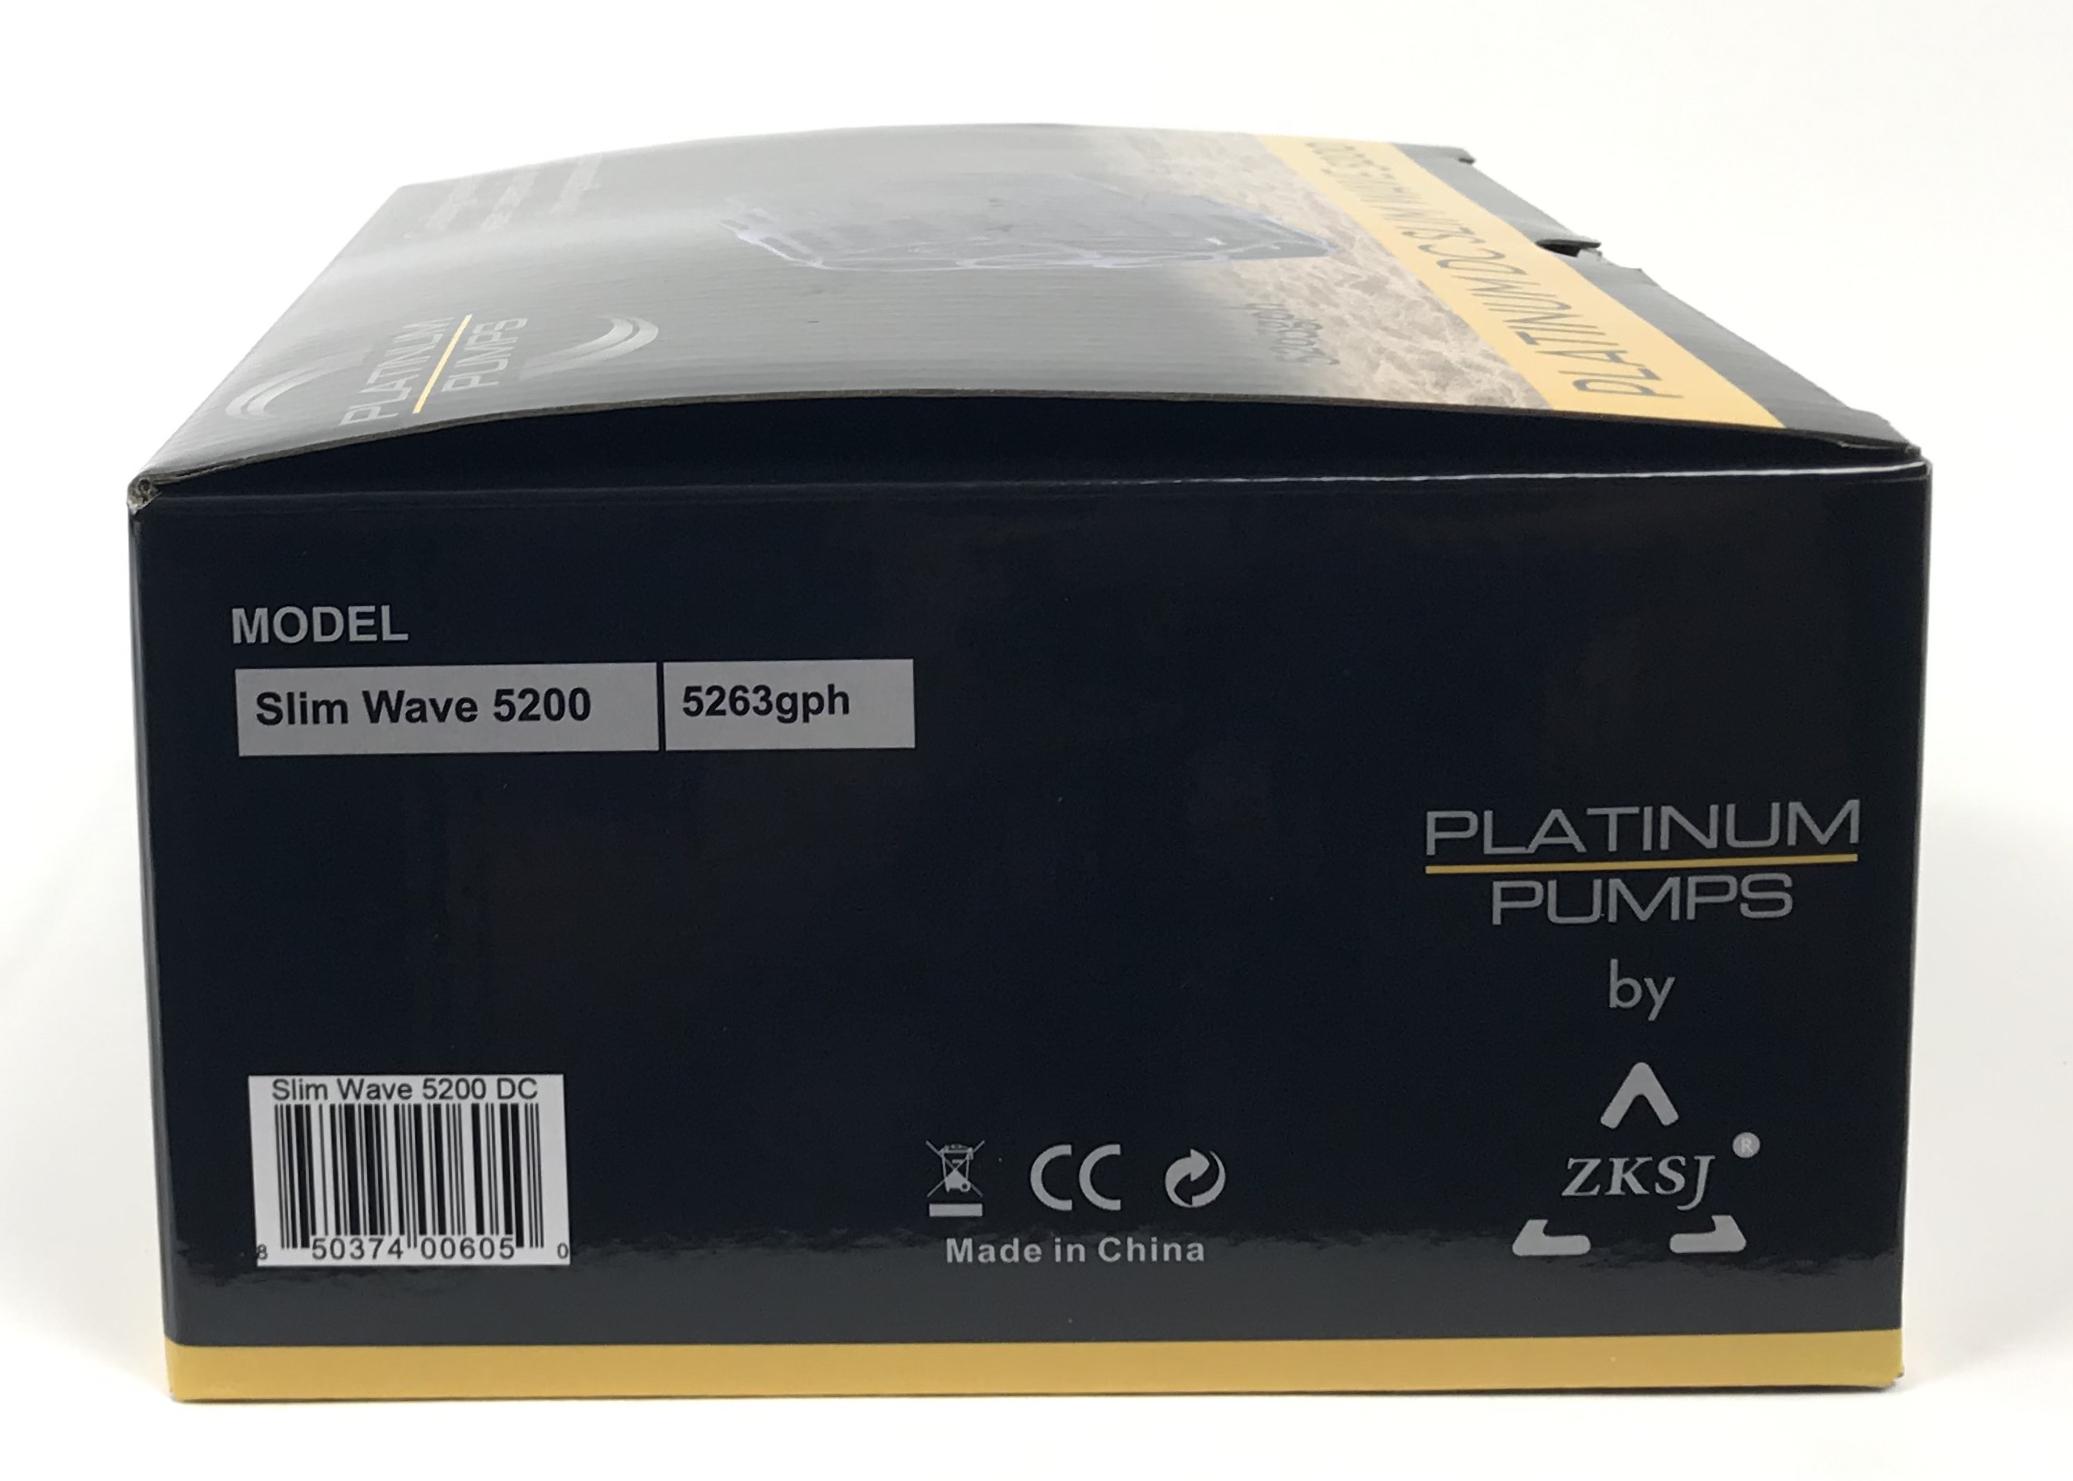 Platinum DC Slim Wave 5200 Pump - 5263 gph